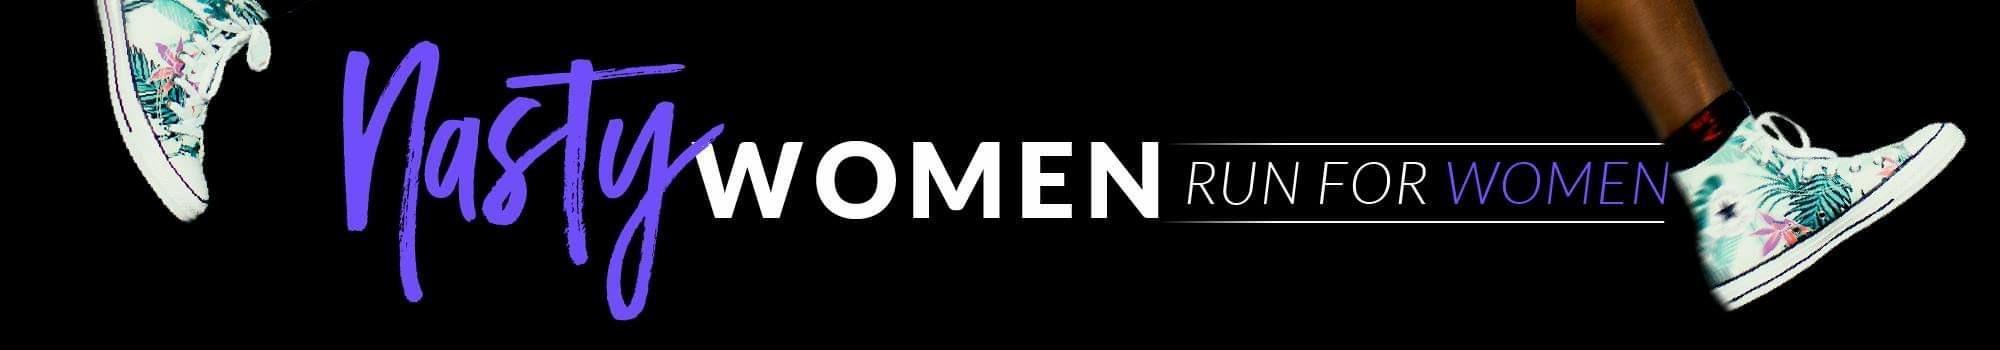 Nasty Women - Fondation des Femmes